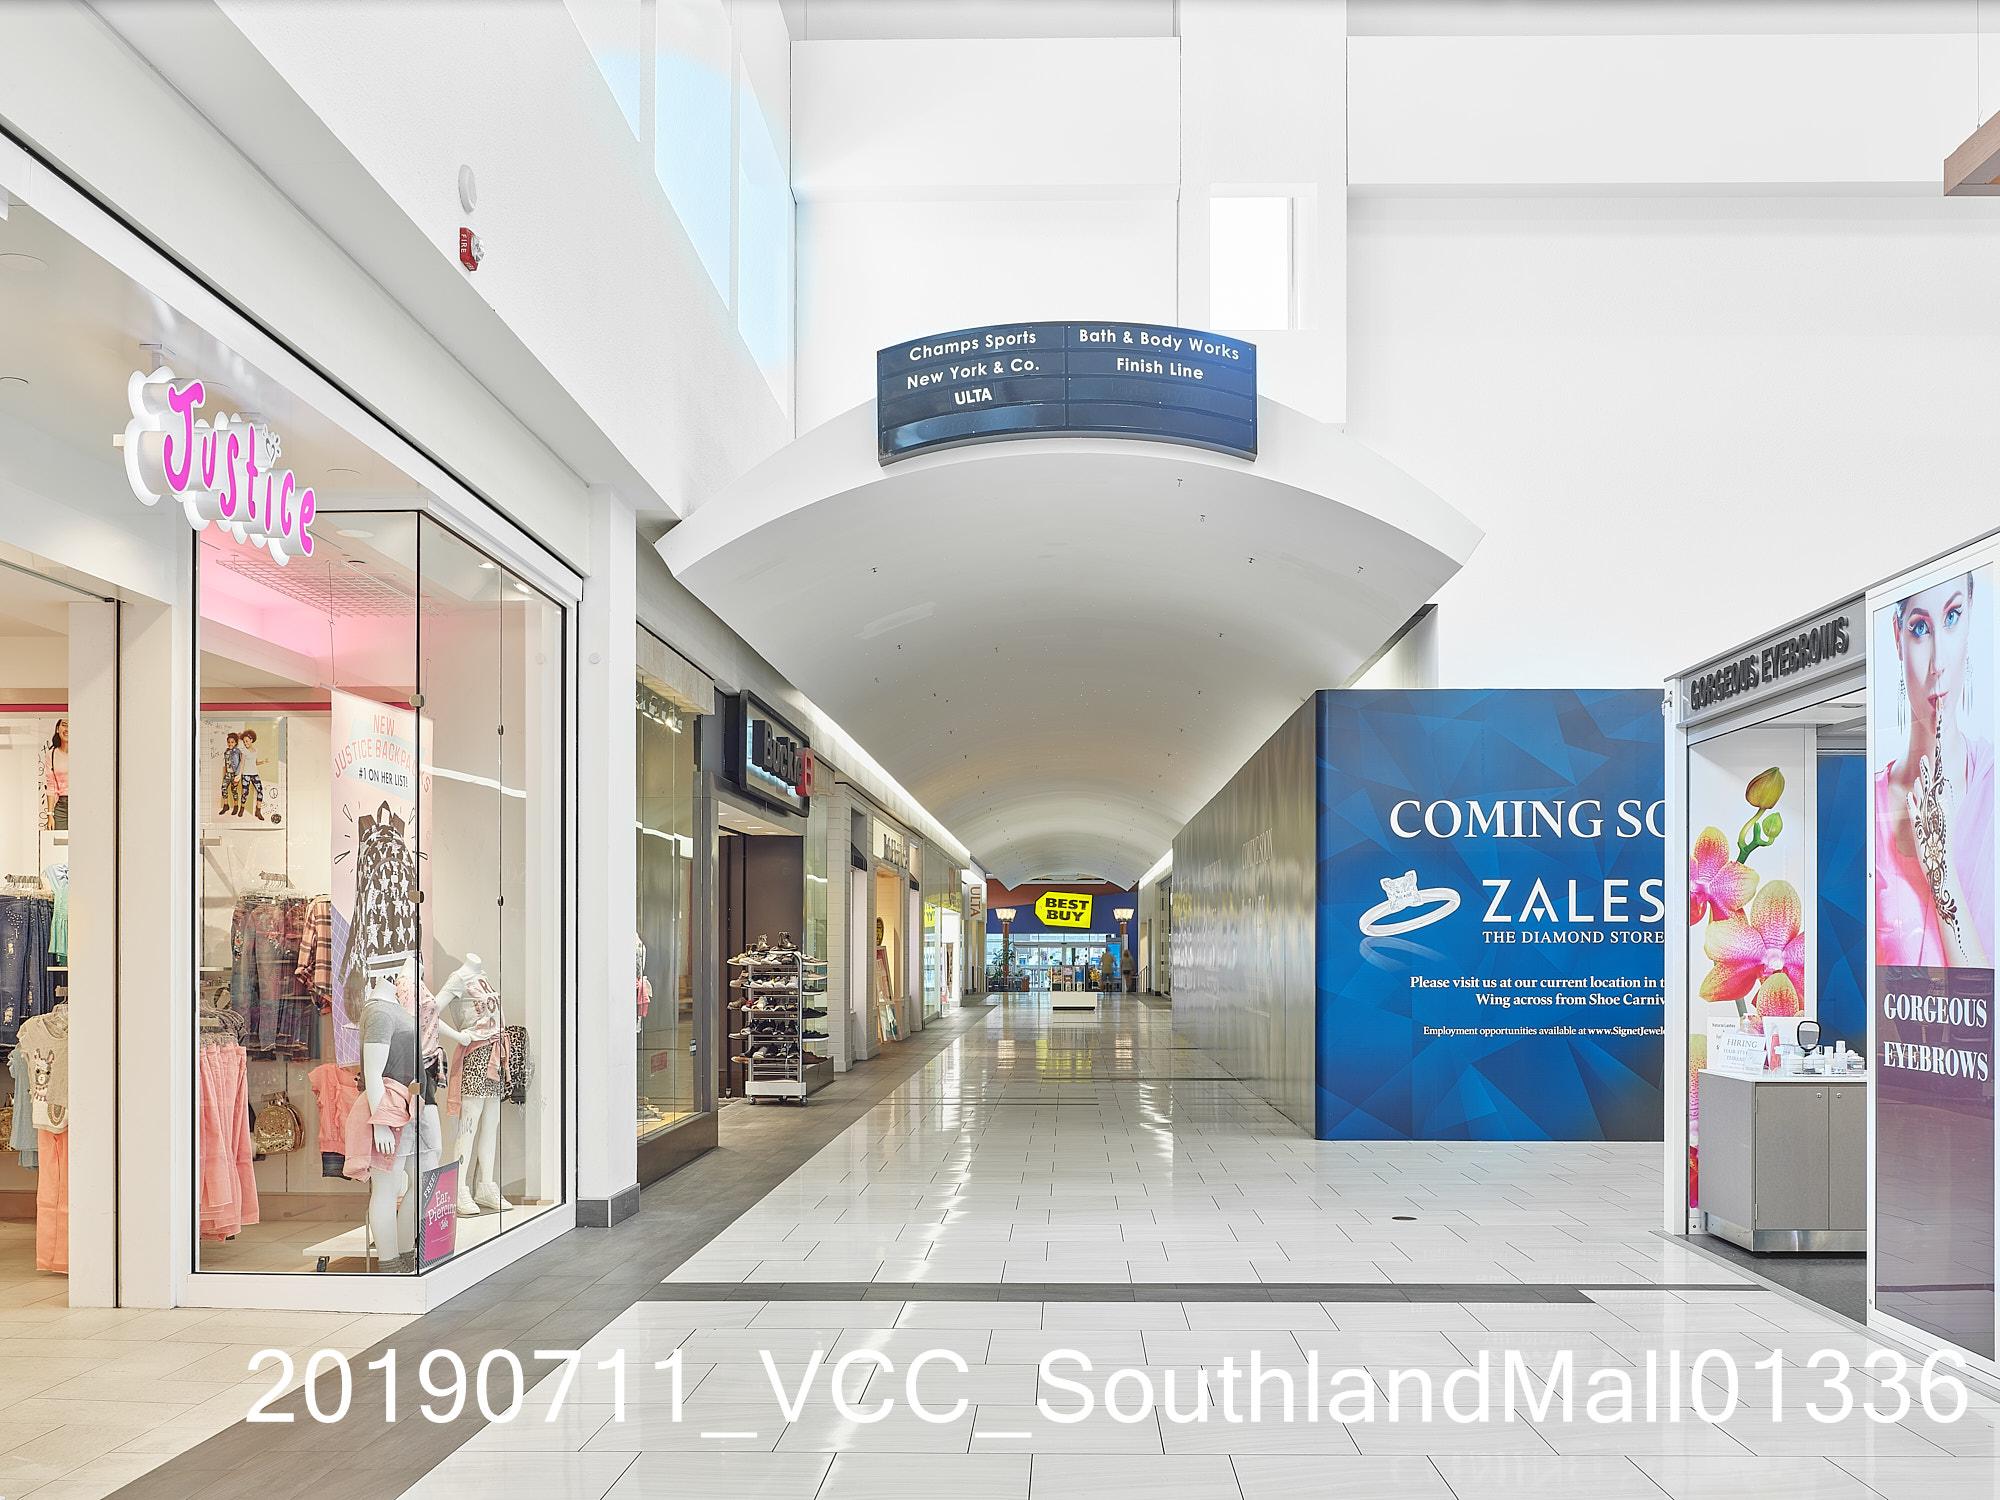 20190711_VCC_SouthlandMall01336.jpg